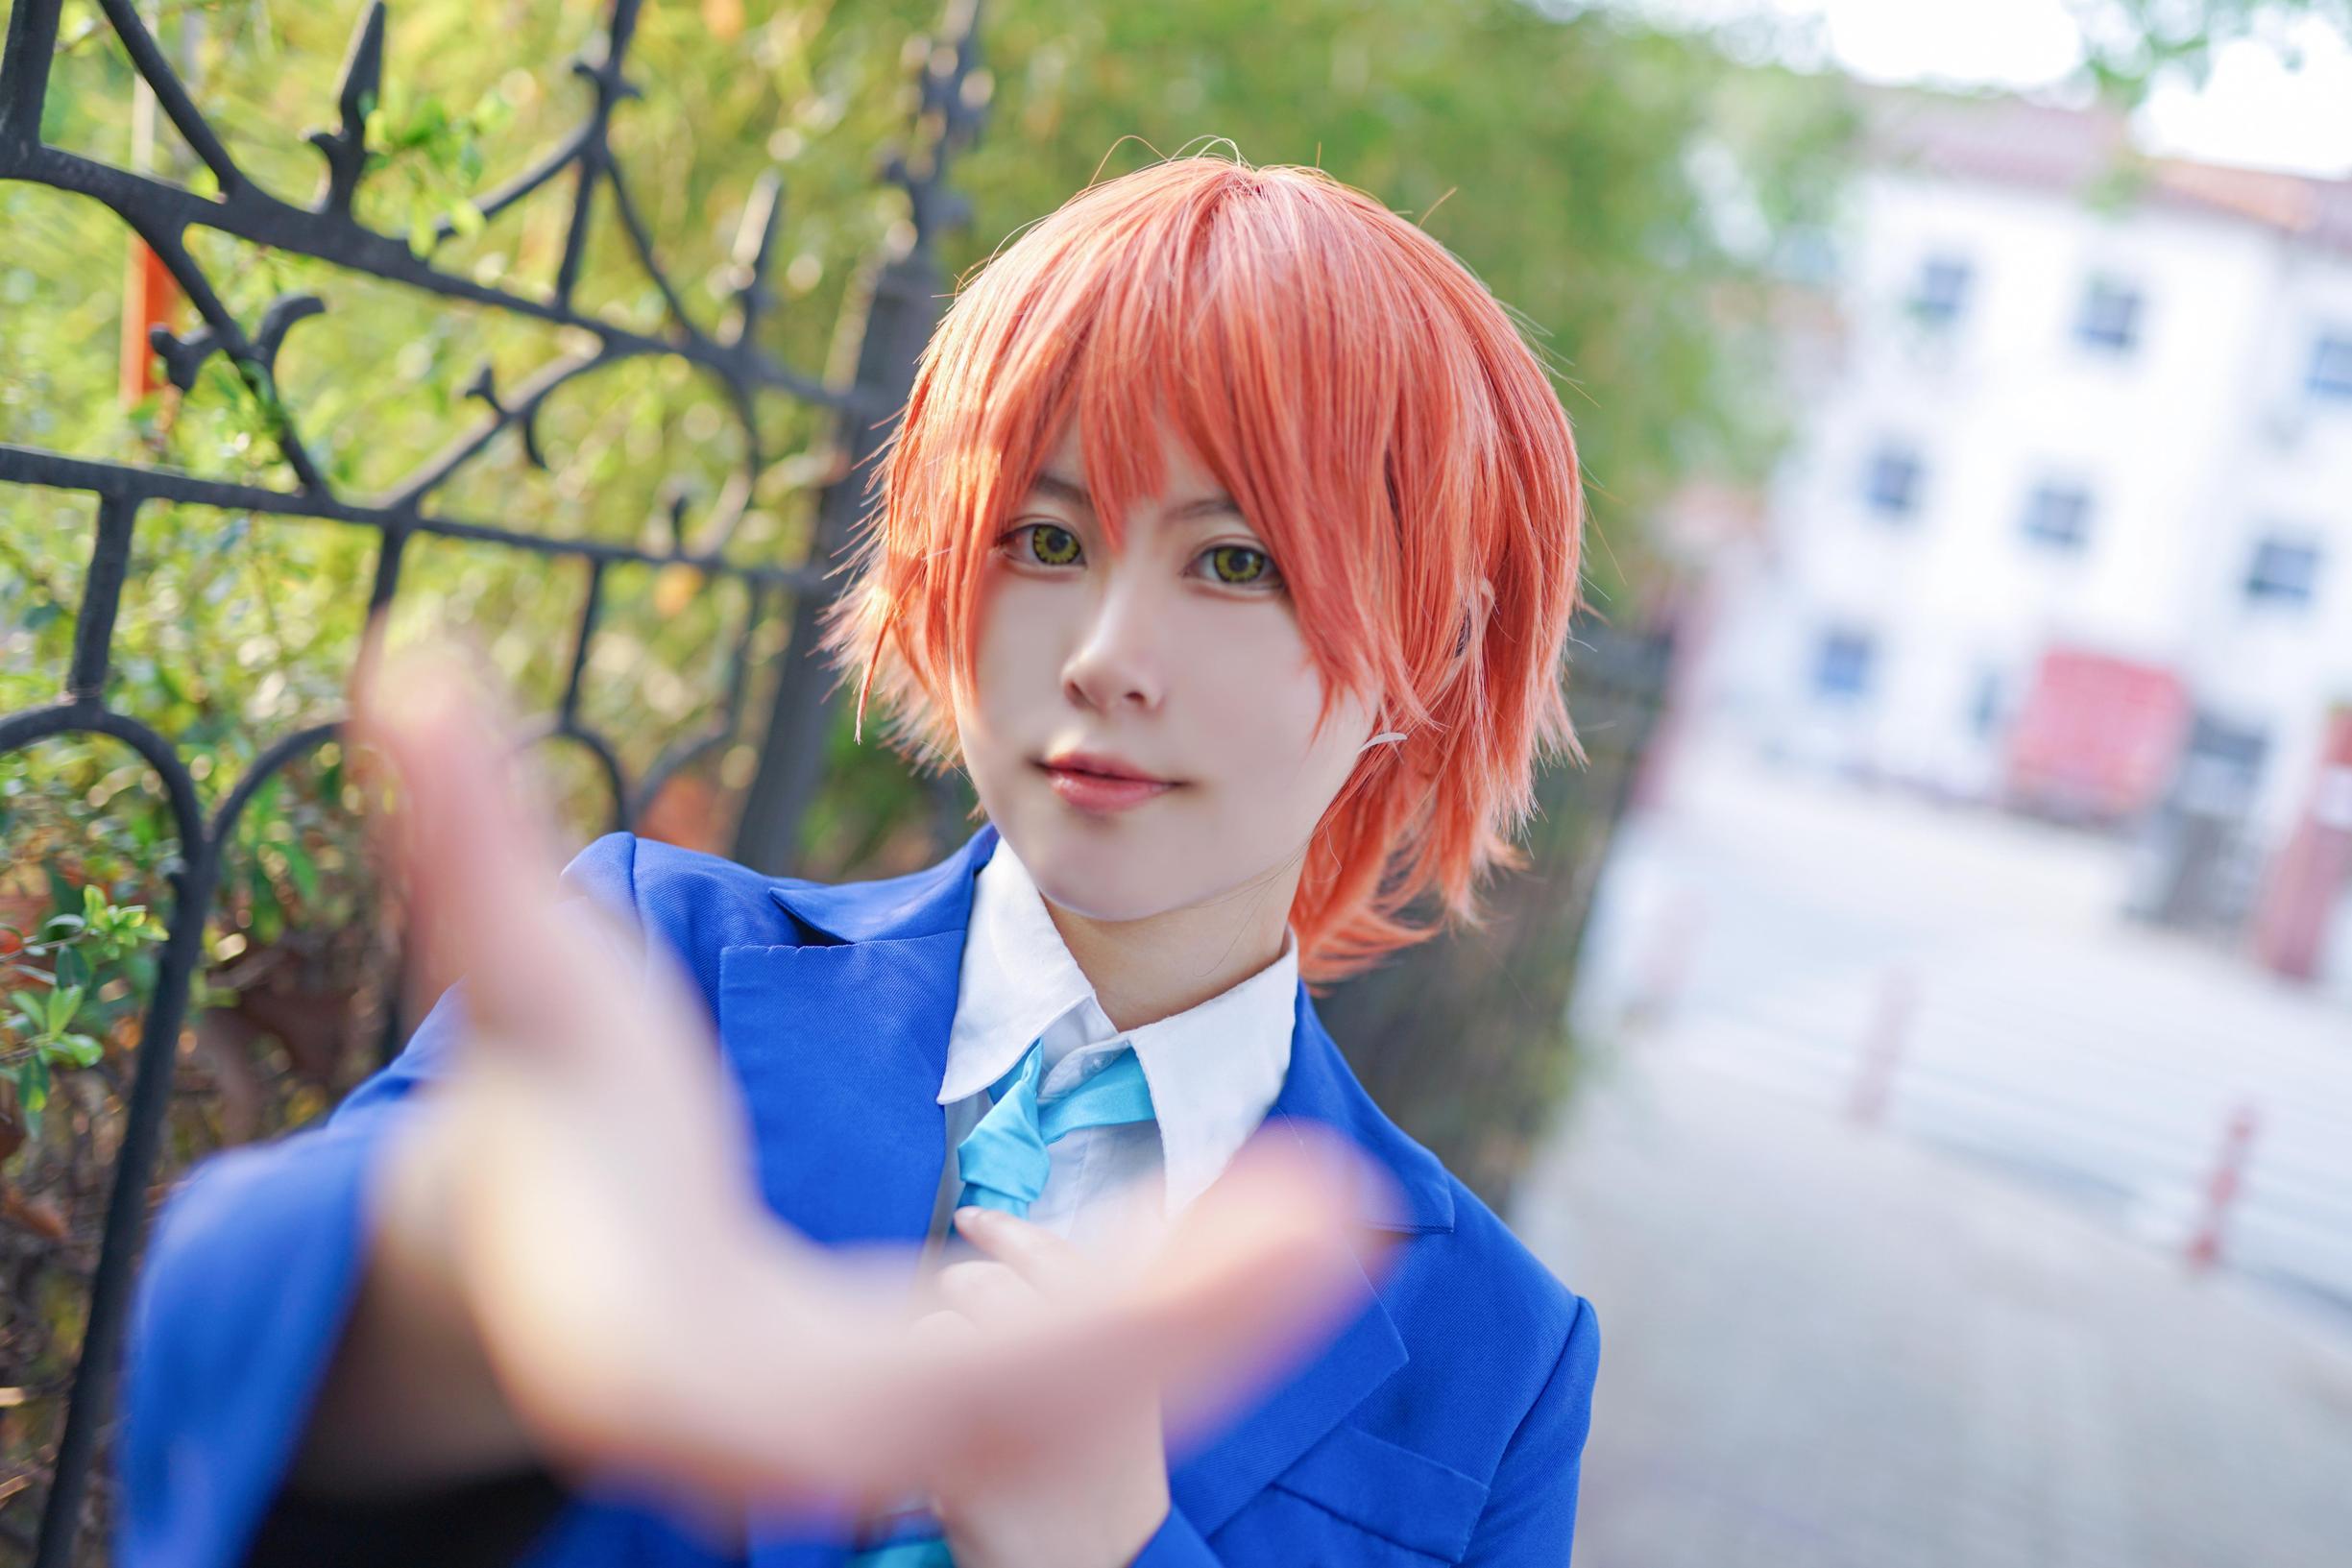 《LOVE LIVE!》正片cosplay【CN:_李笑颜Lee】-第11张